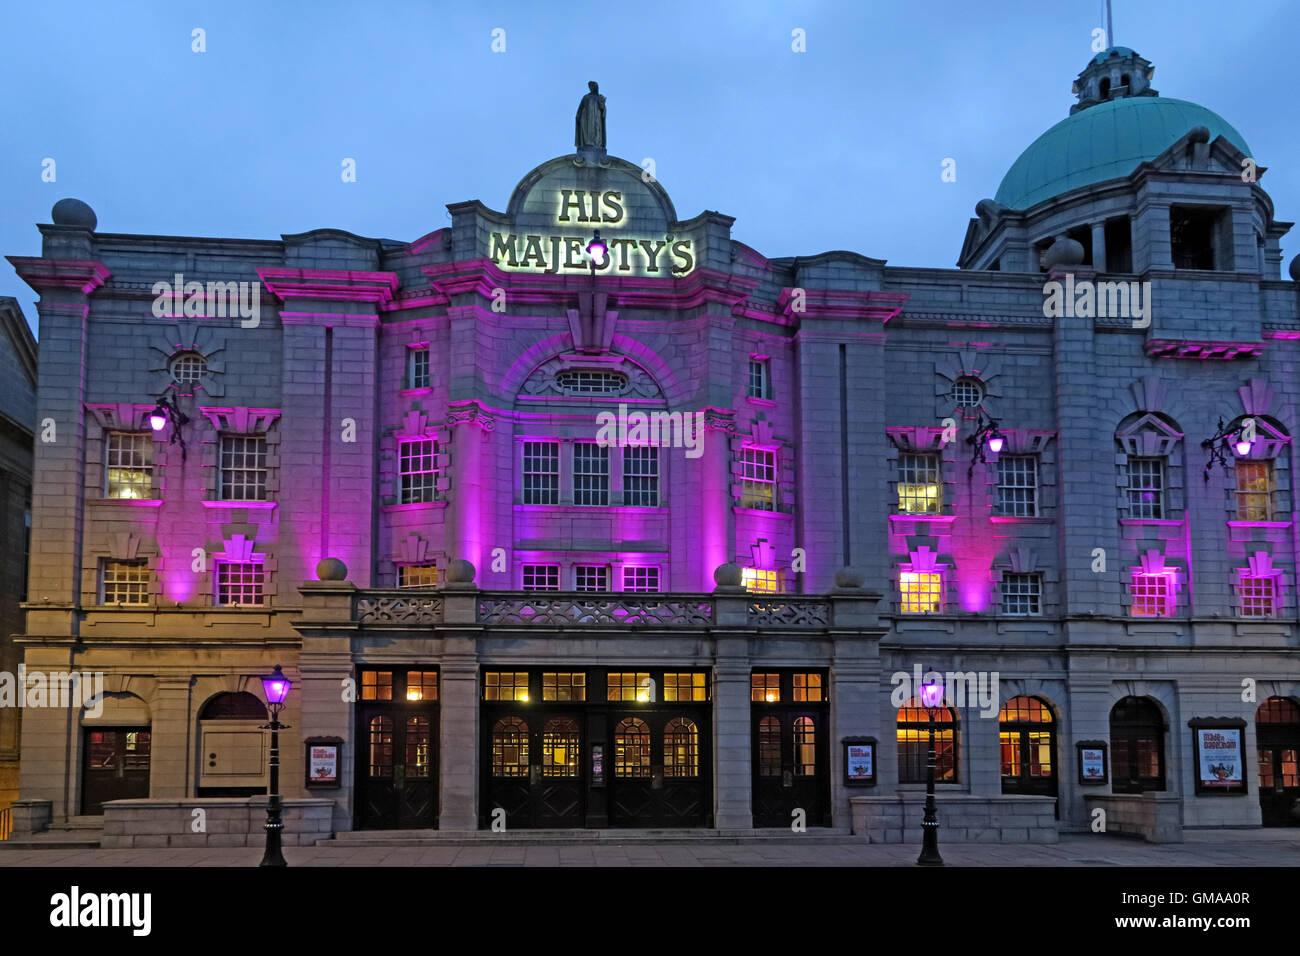 Scotland,UK,at,night,blue,hour,bluehour,art,arts,Aberdeenshire,culture,plays,ballet,performing,arts,fund,funding,success,failure,shot,nightshot,evening,Scotland,UK,at,tripod,purple,evening,Rosemount,Viaduct,Scotland,AB25,1GL,AB251GL,His Majestys Theatre,His Majesties Theatre,GoTonySmith,@HotpixUK,HotpixUK,United,Kingdom,GB,English,British,interesting,unique,center,oil,arts,centre,play,performance,performances,building,victorian,Buy Pictures of,Buy Images Of,Images of,Stock Images,United Kingdom,Great Britain,great pictures of,great photos of,His Majestys,Aberdeen City,His Majestys Theatre,Aberdeen City Centre